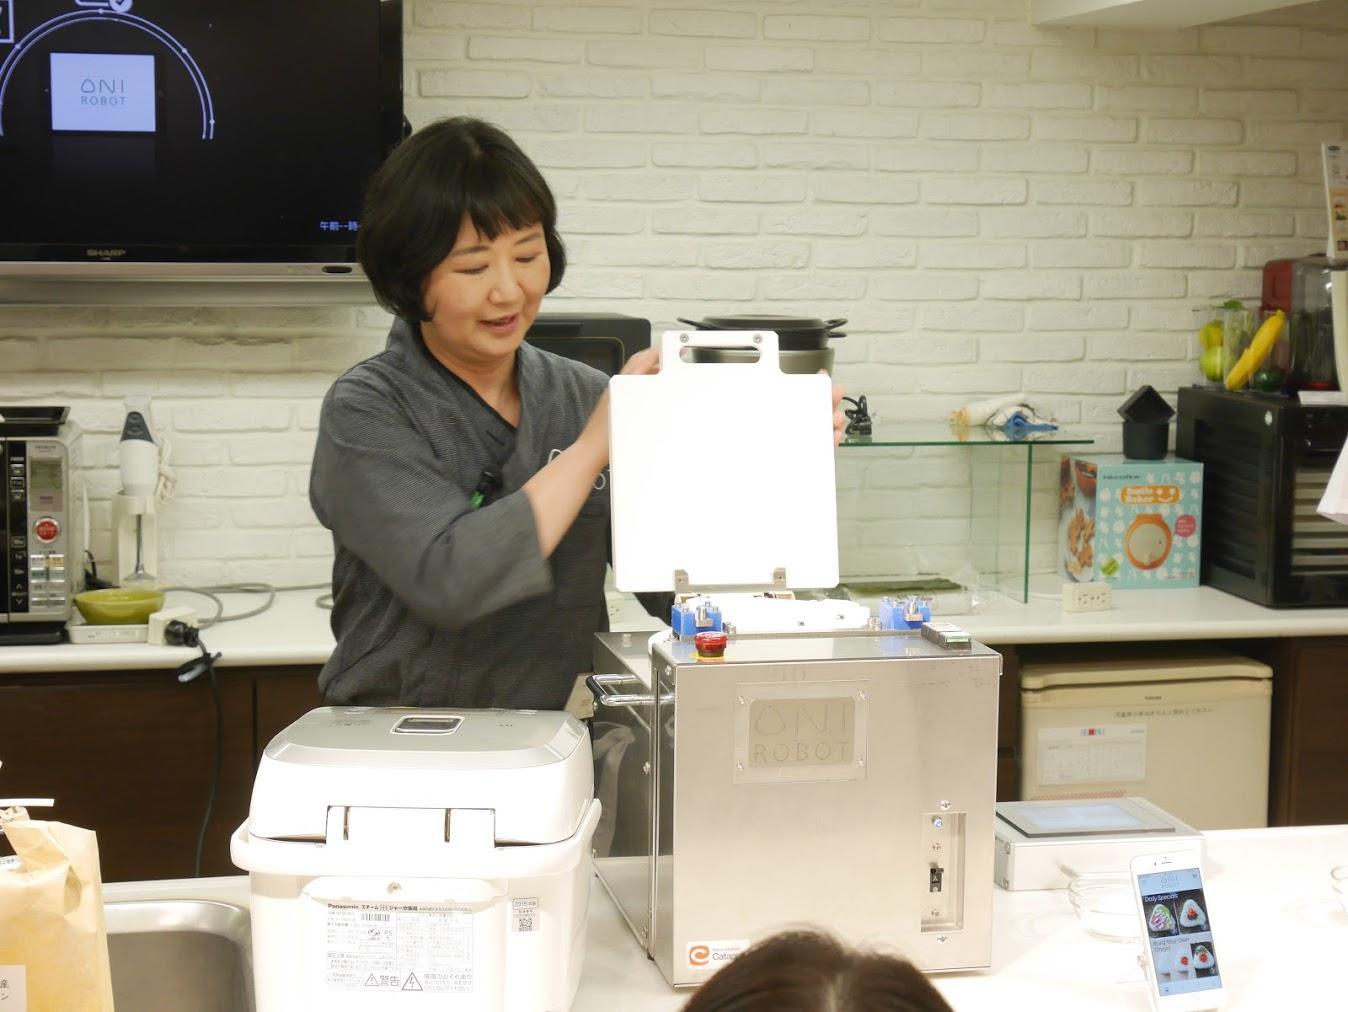 9_OniRobotを紹介する加古_Saori showing OniRobot.JPG